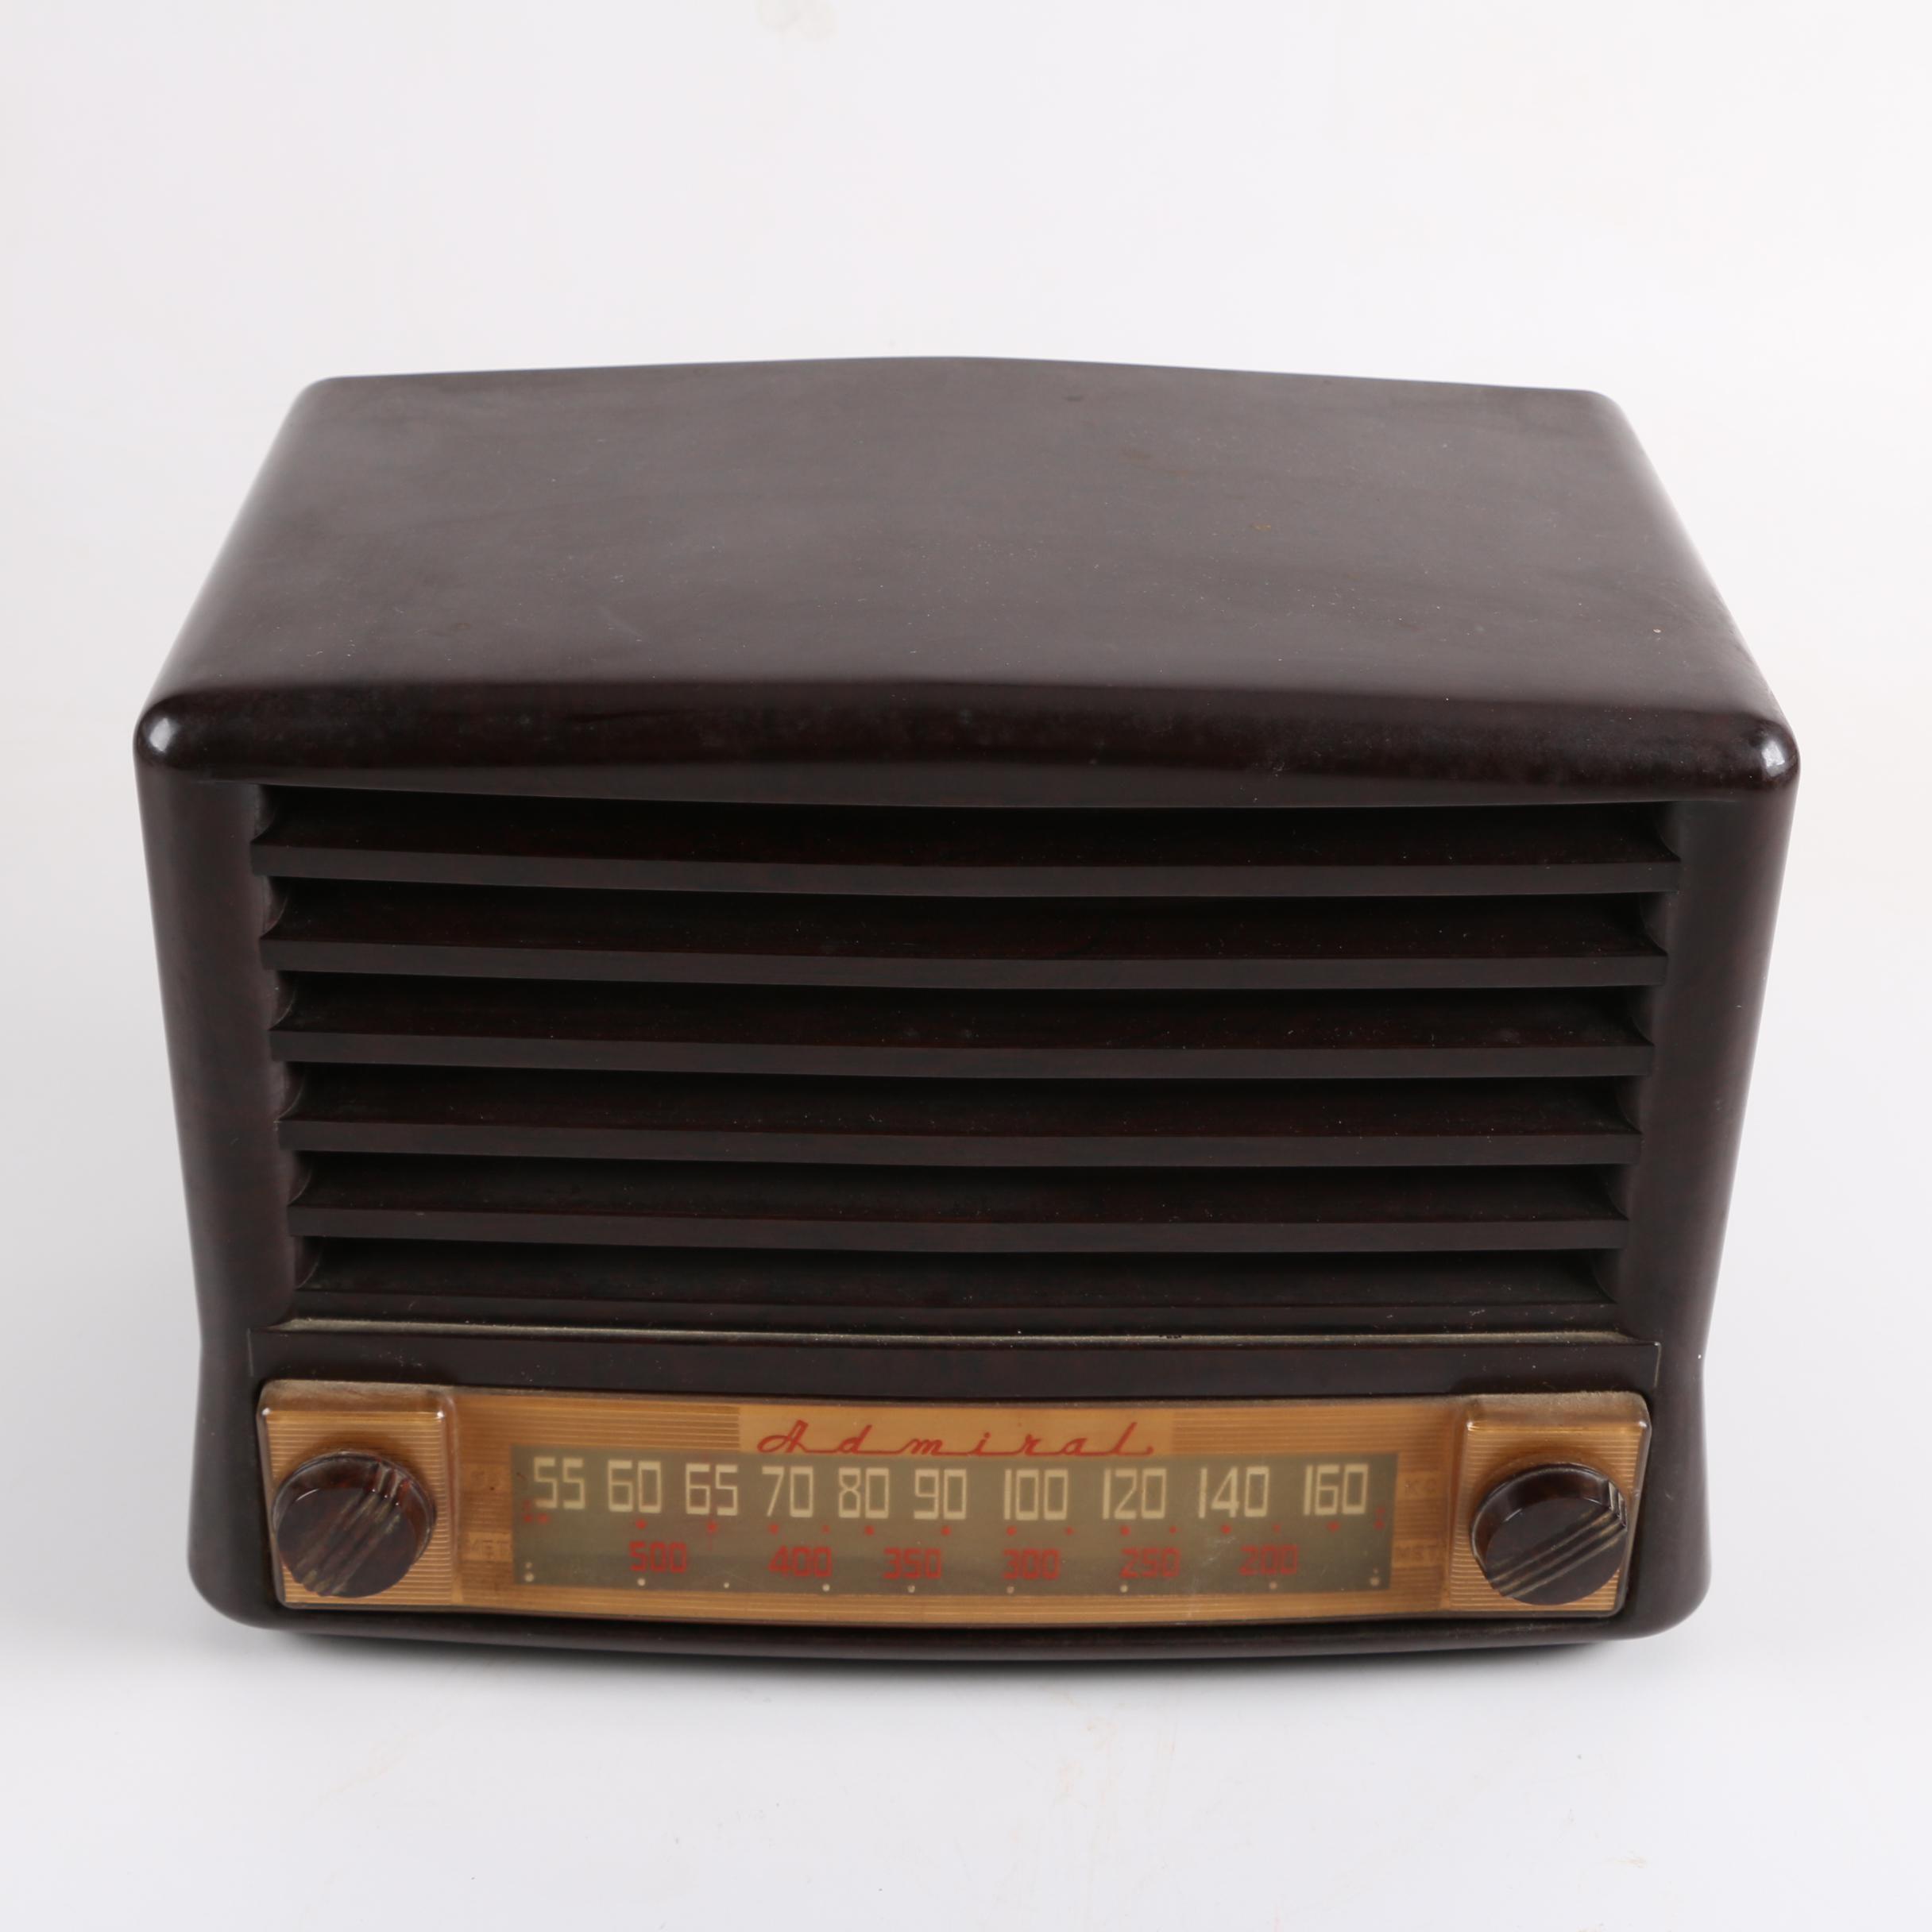 C. 1940s Admiral Super Aeroscope Radio With Built-In Antenna